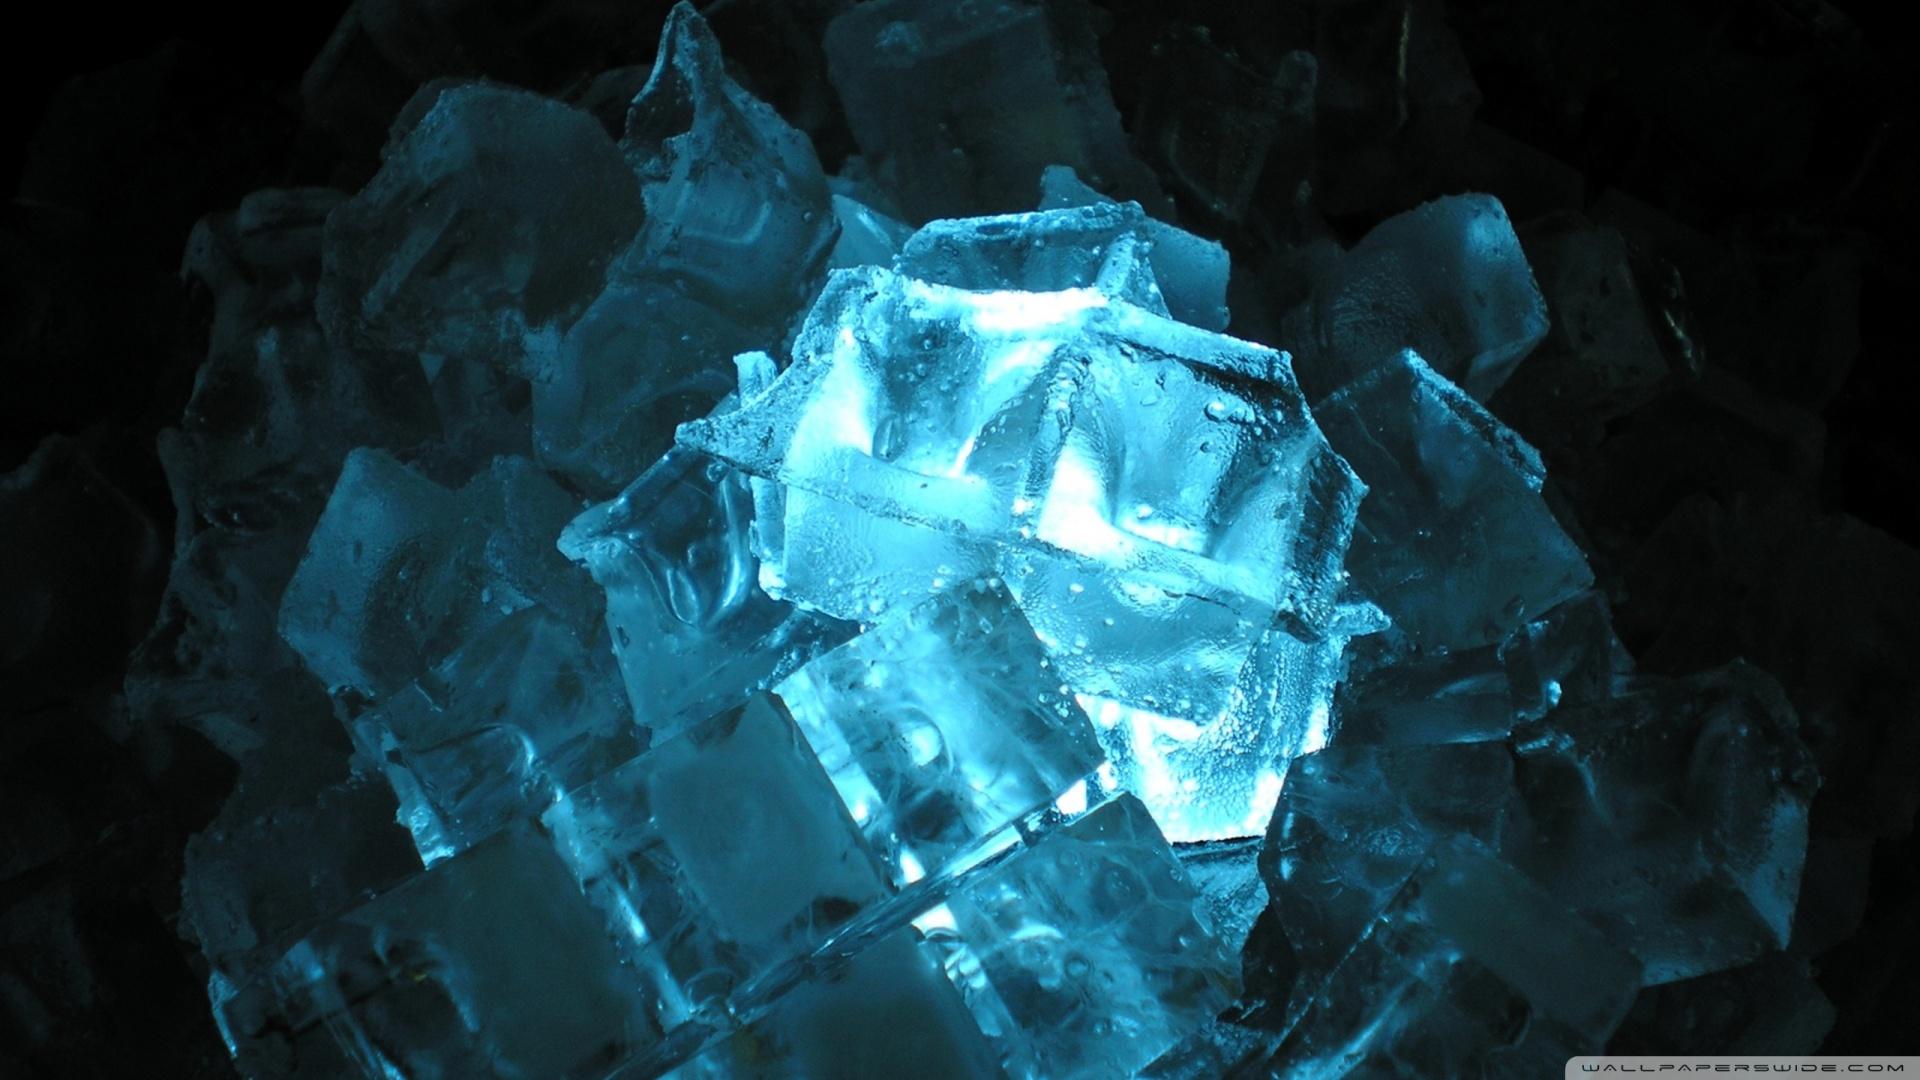 Ice Cubes Wallpaper 1920x1080 Ice Cubes 1920x1080